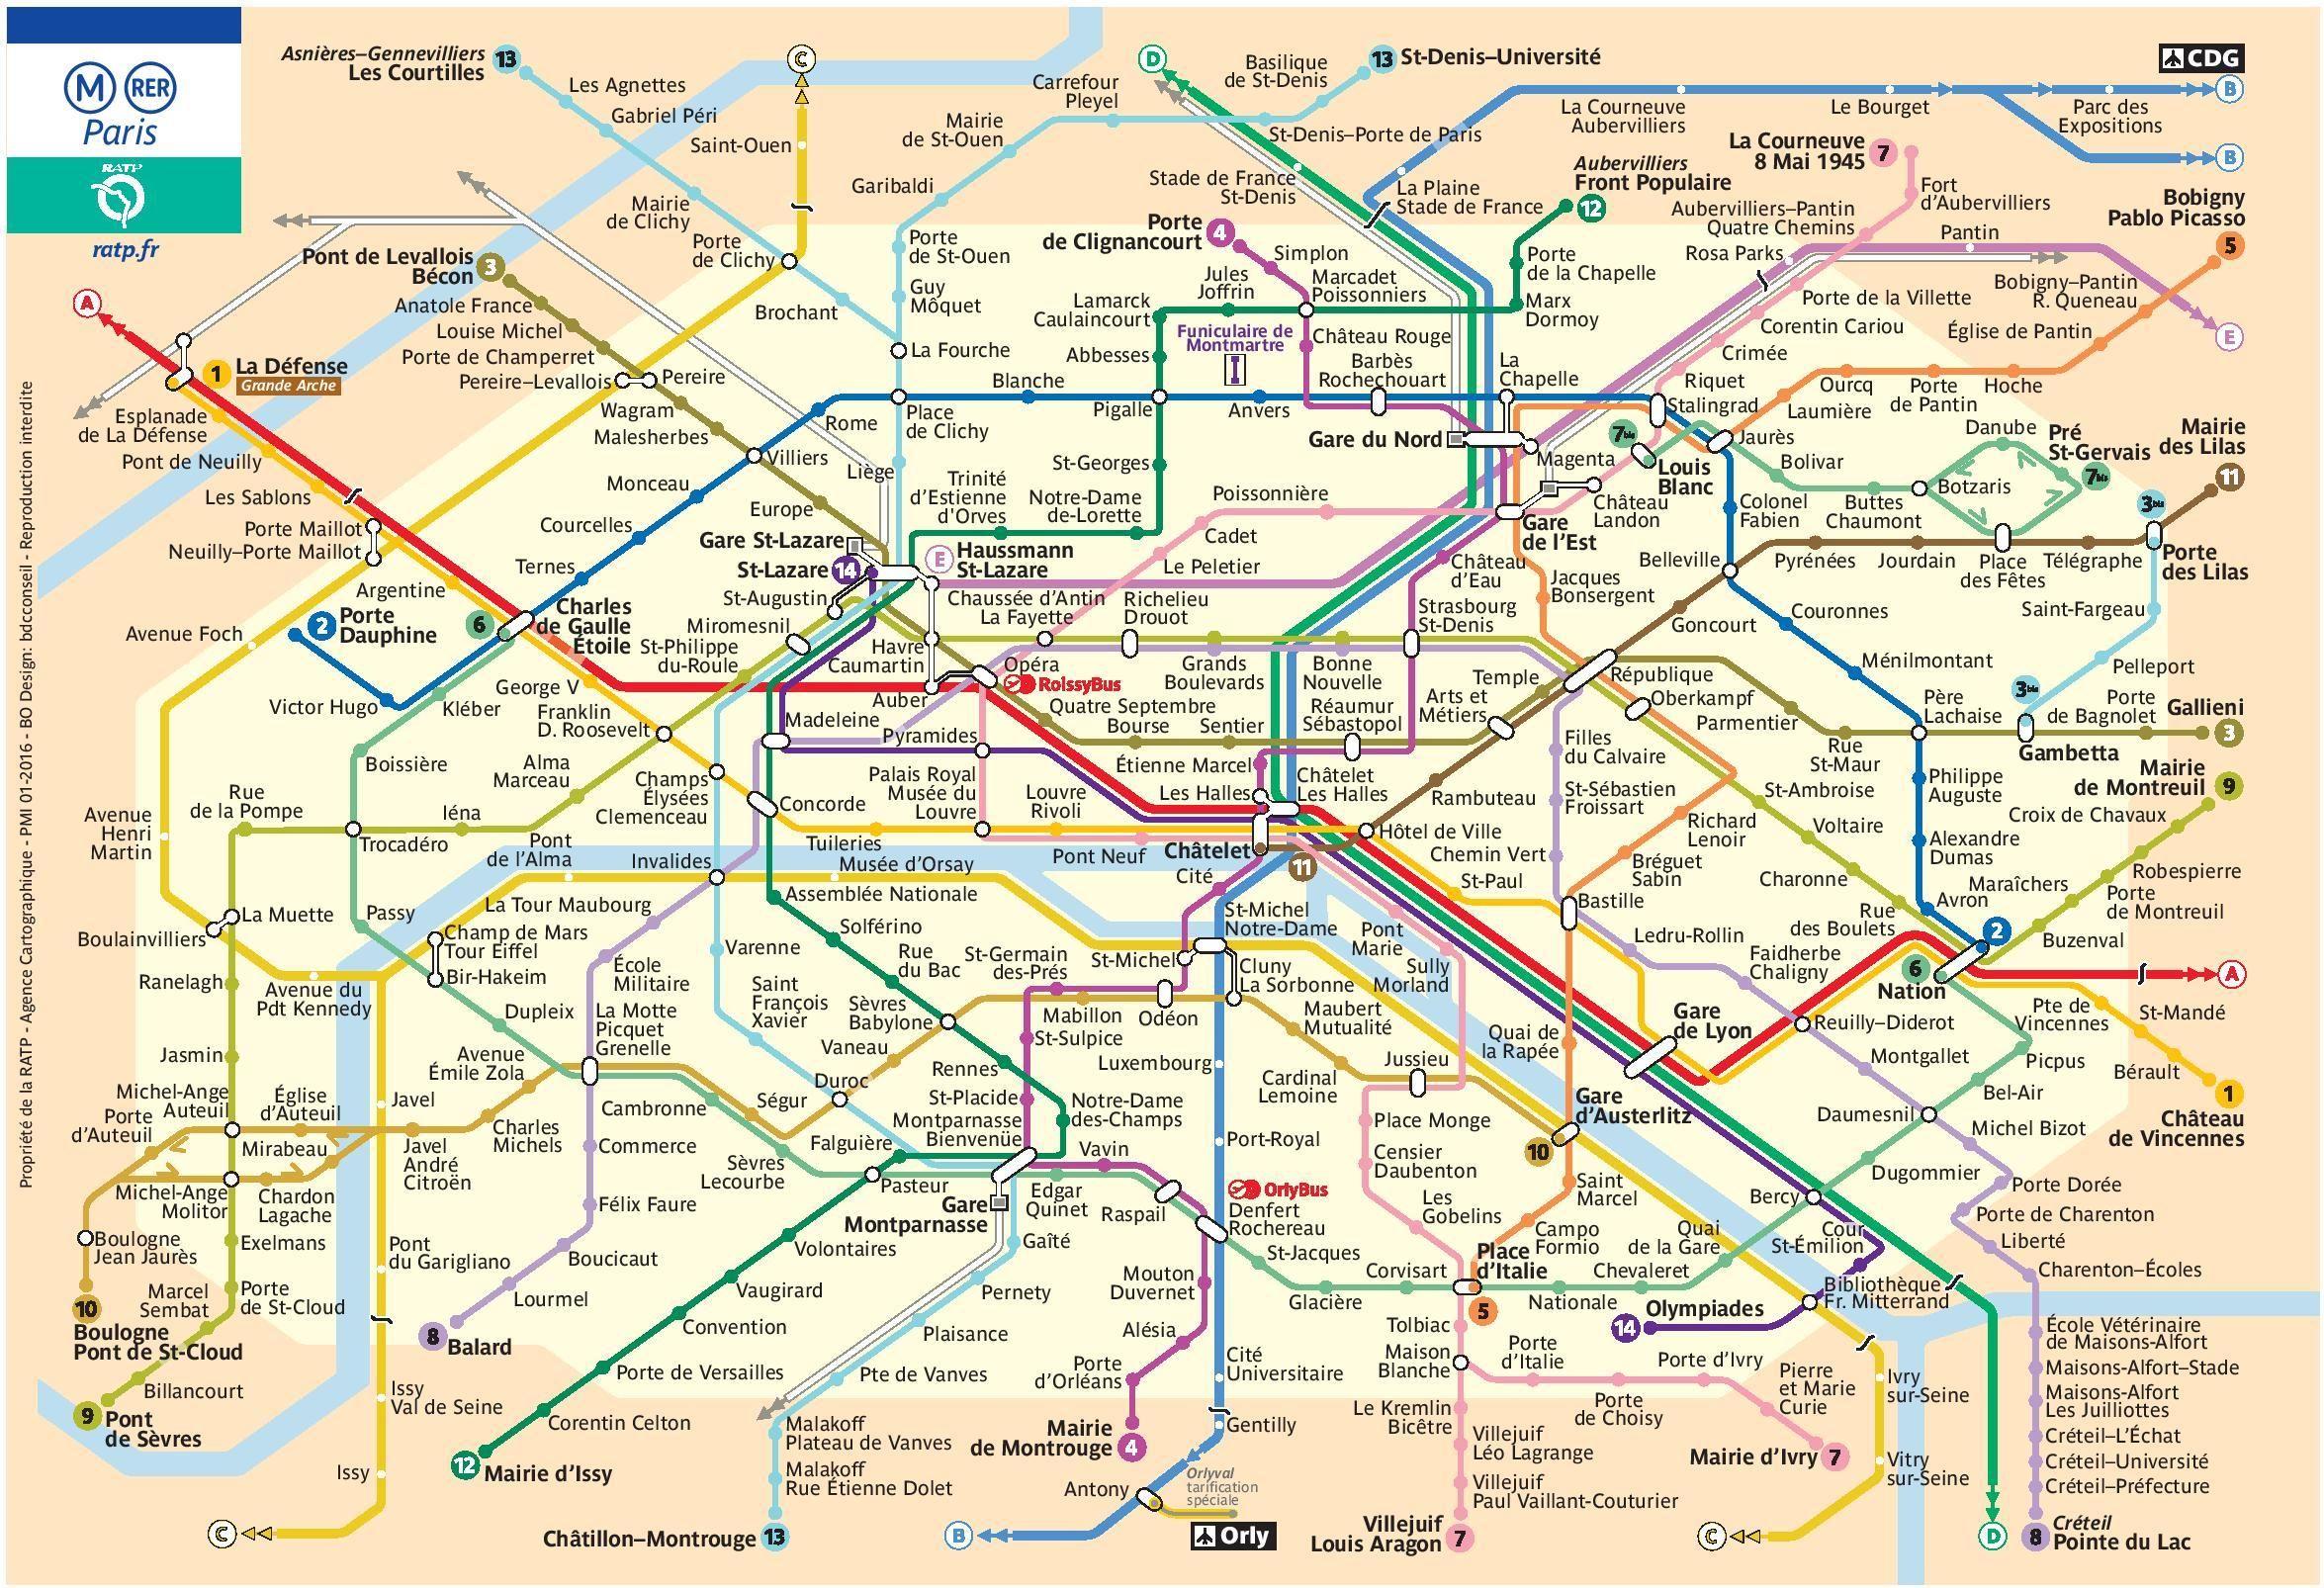 Plan Metro Paris Ratp Pdf Gratuit A Telecharger Plan Metro Paris